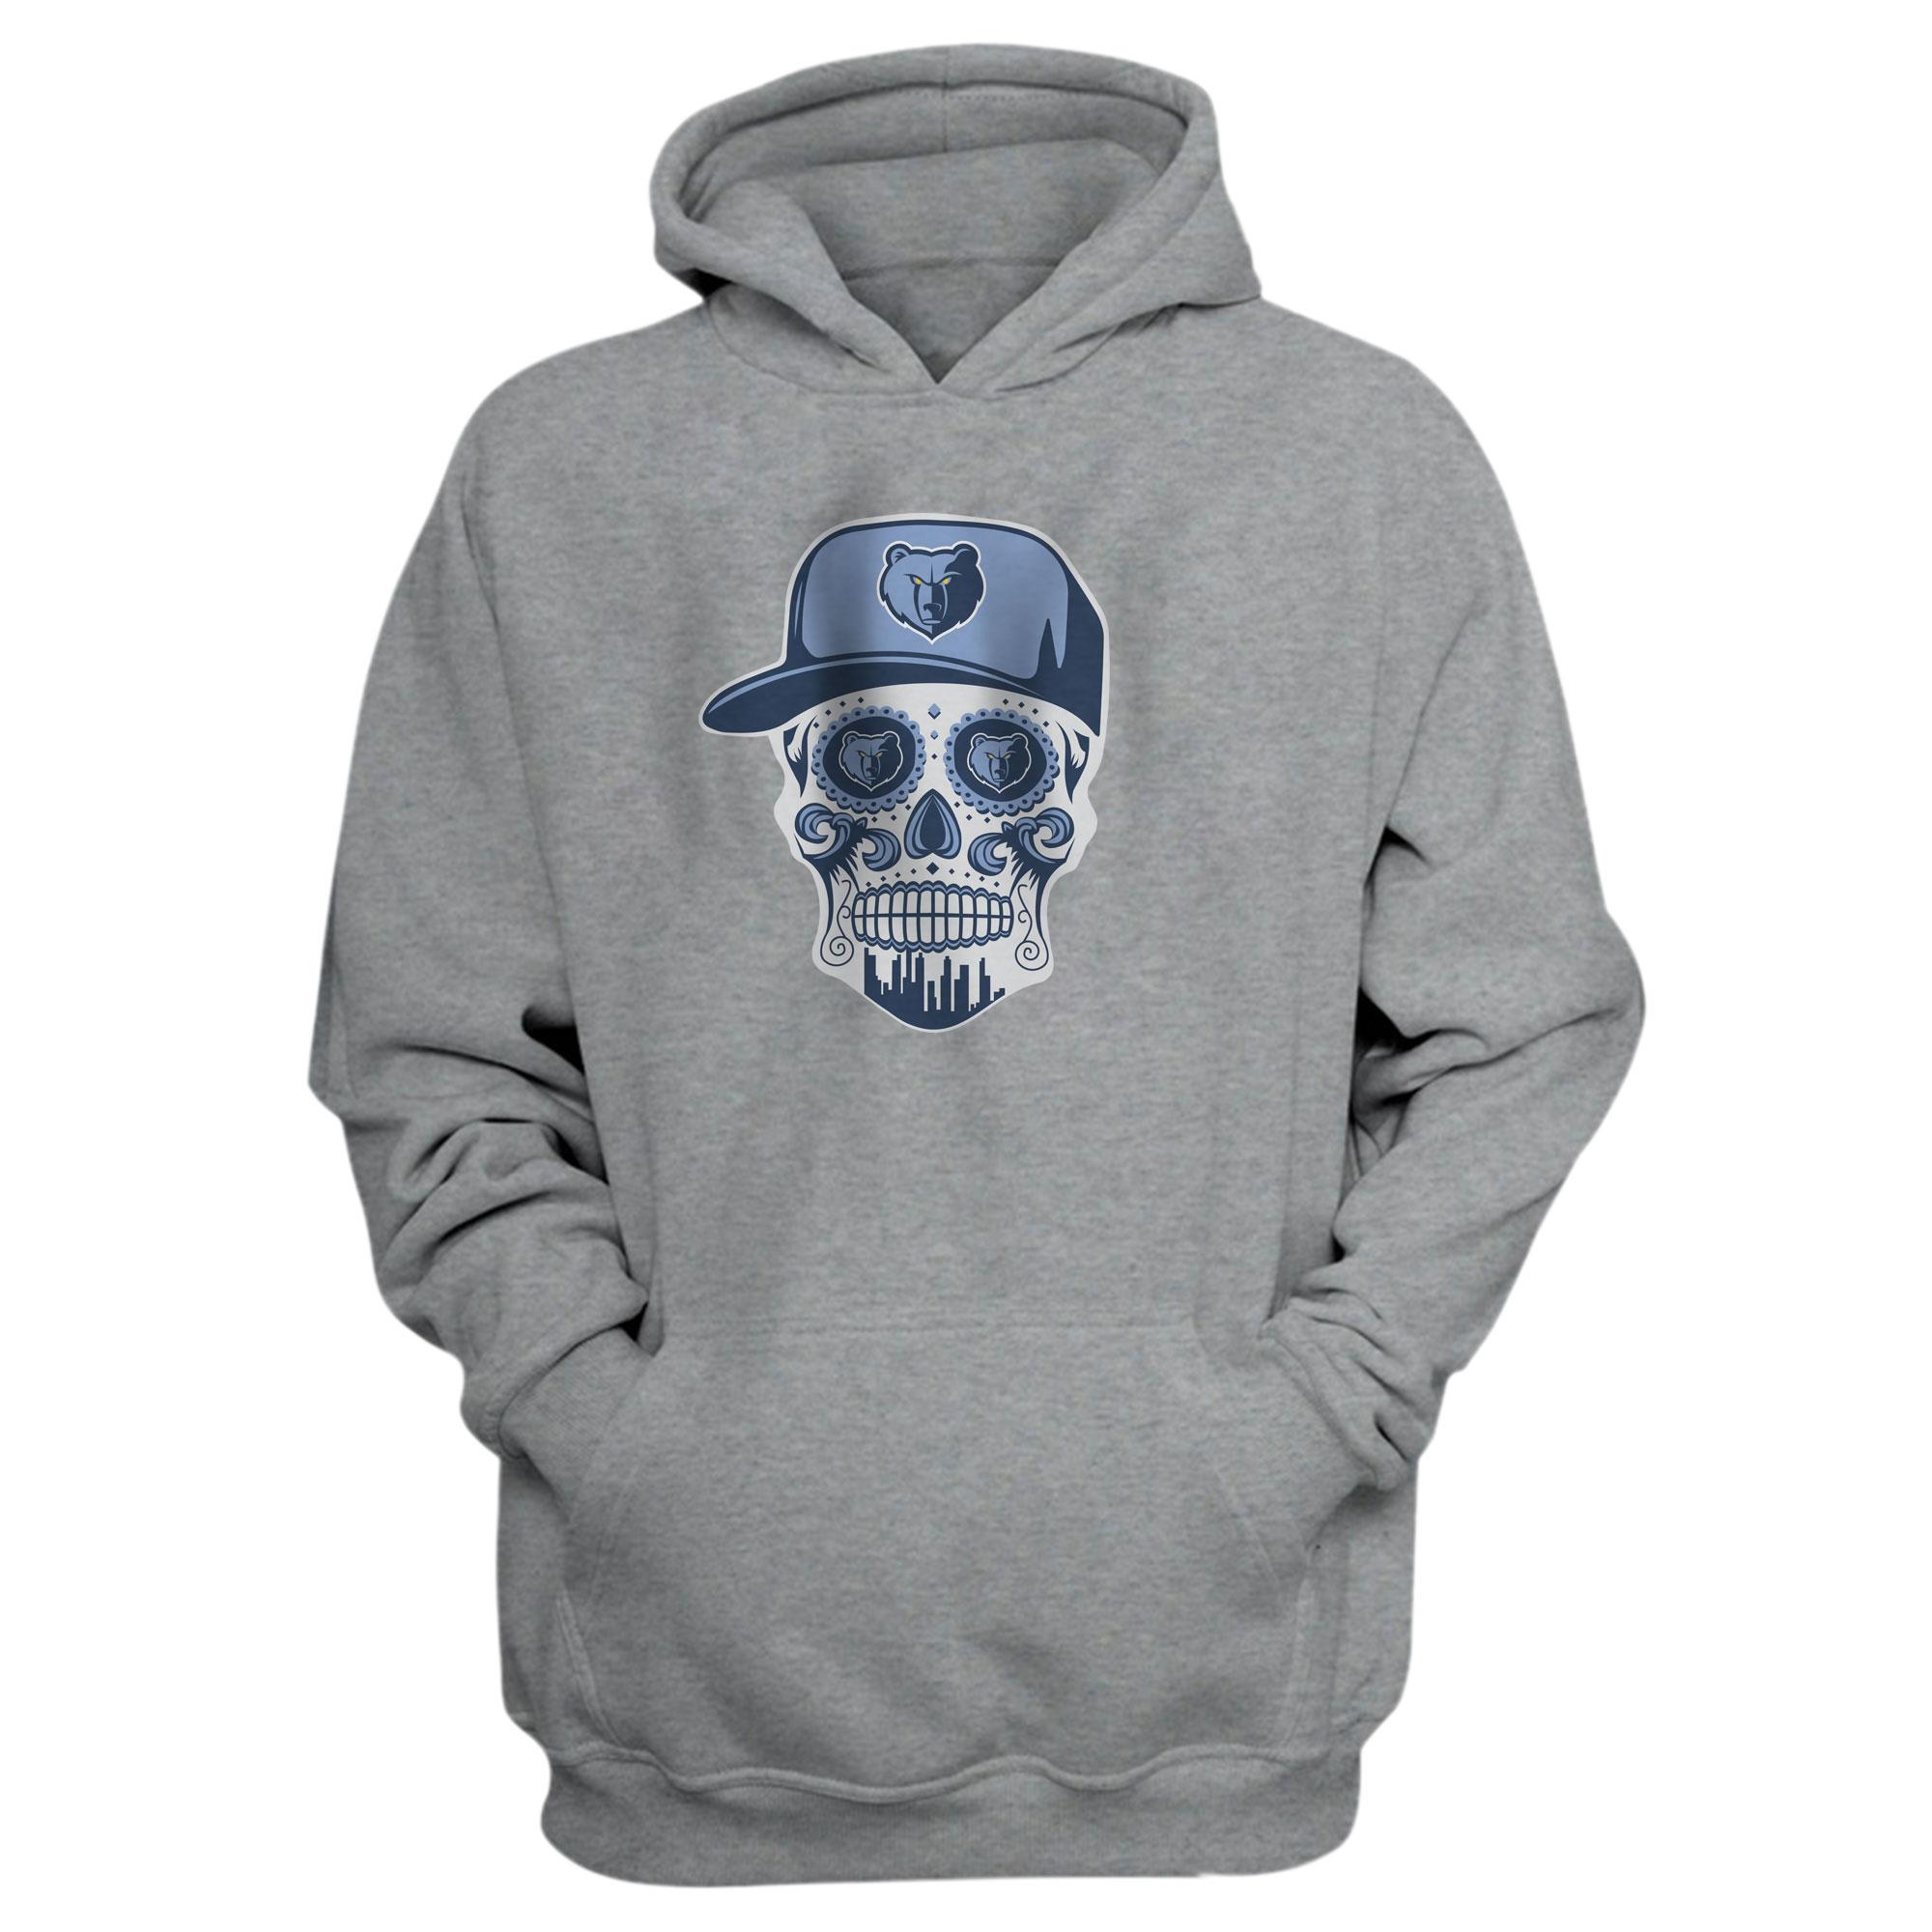 Memphis Skull Hoodie (HD-GRY-NP-455-NBA-MEM-SKULL)